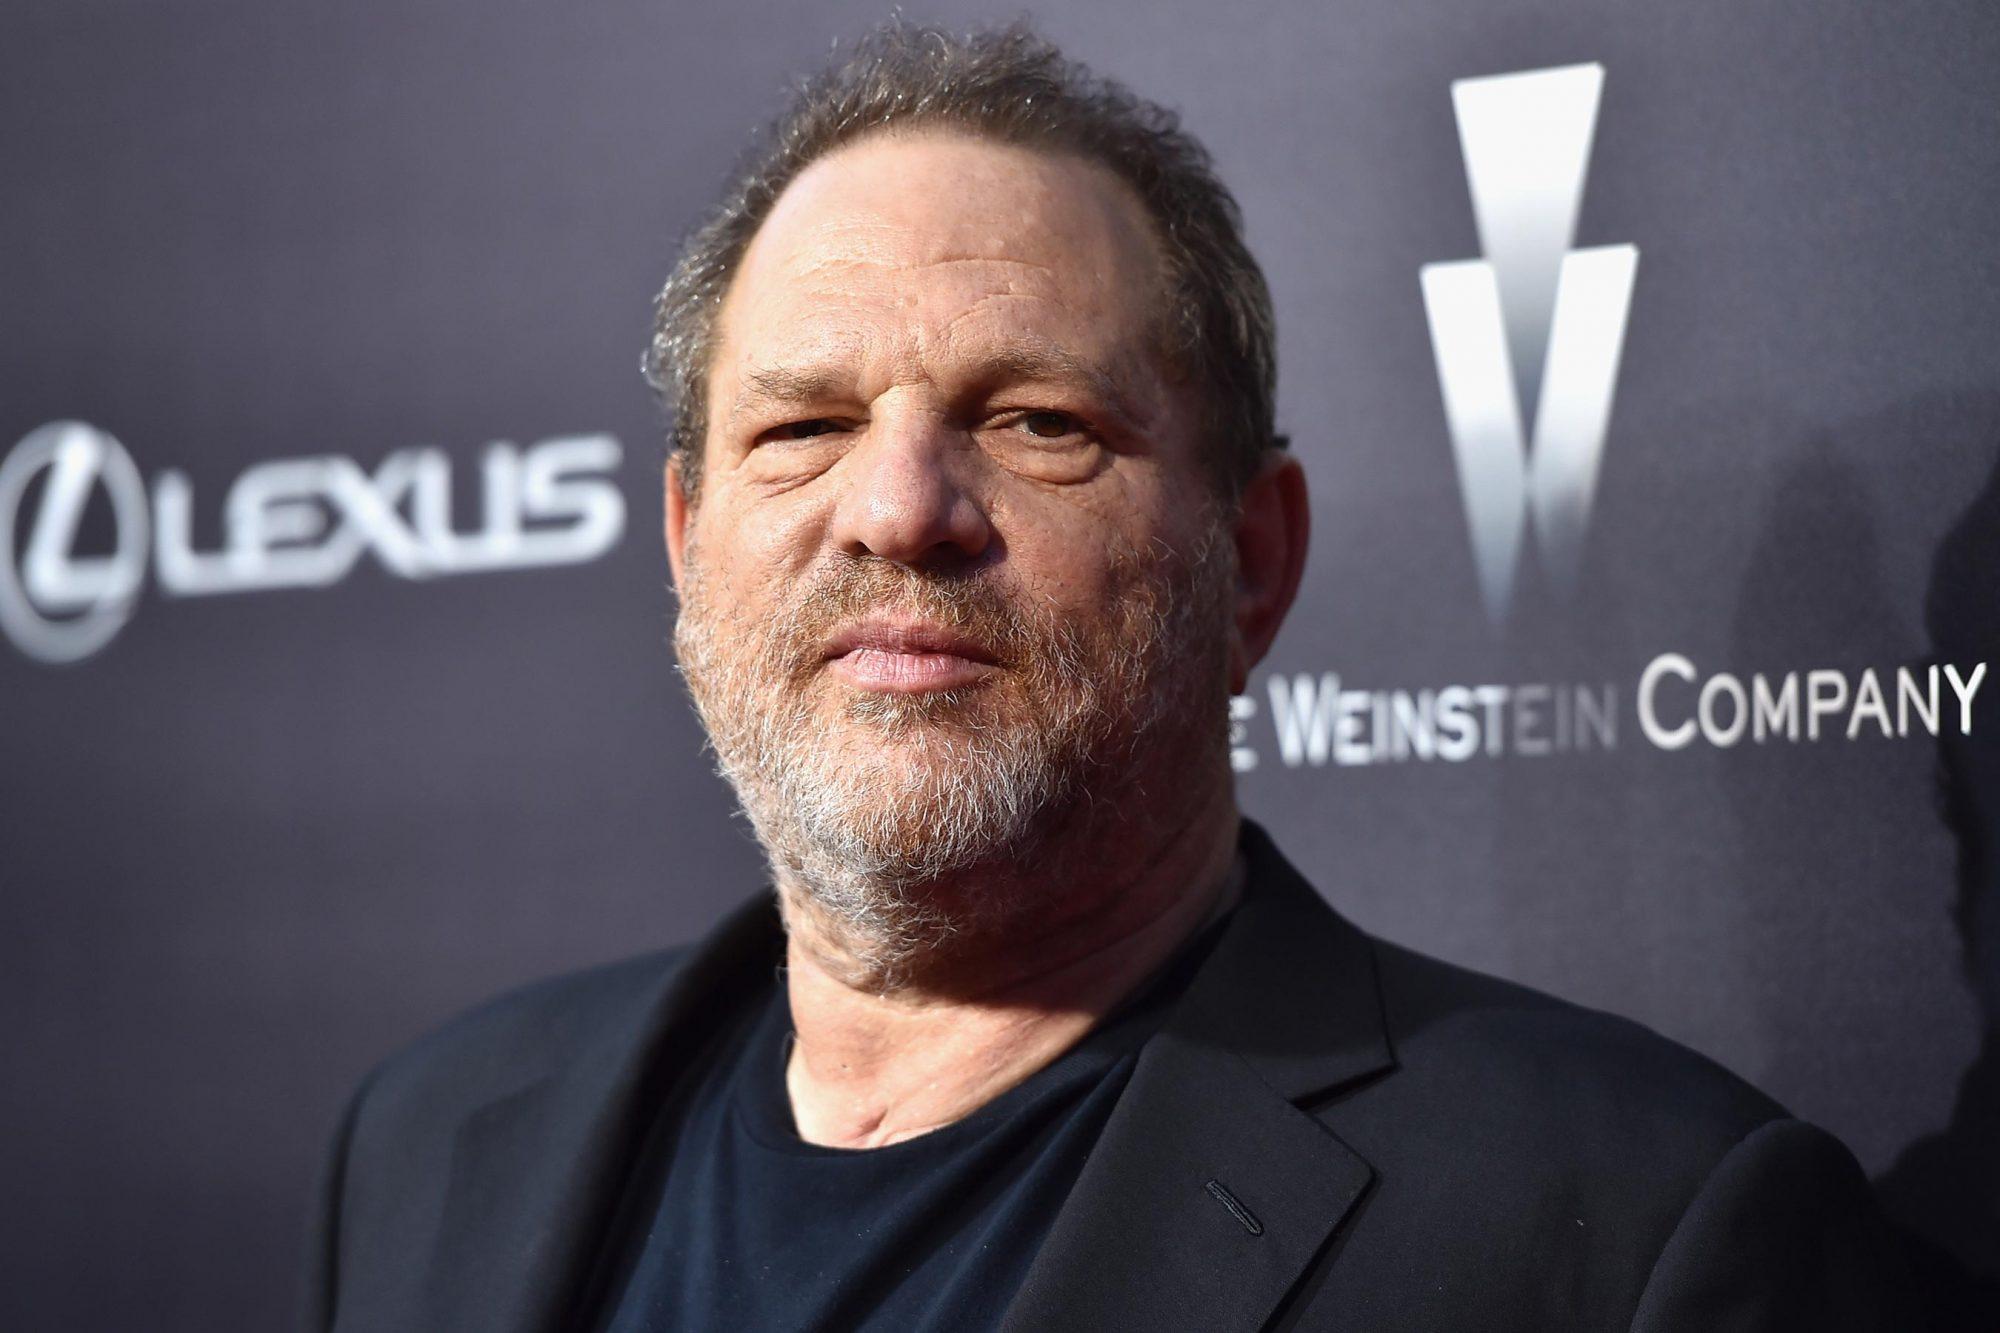 The Weinstein Company And Lexus Present Lexus Short Films - Red Carpet